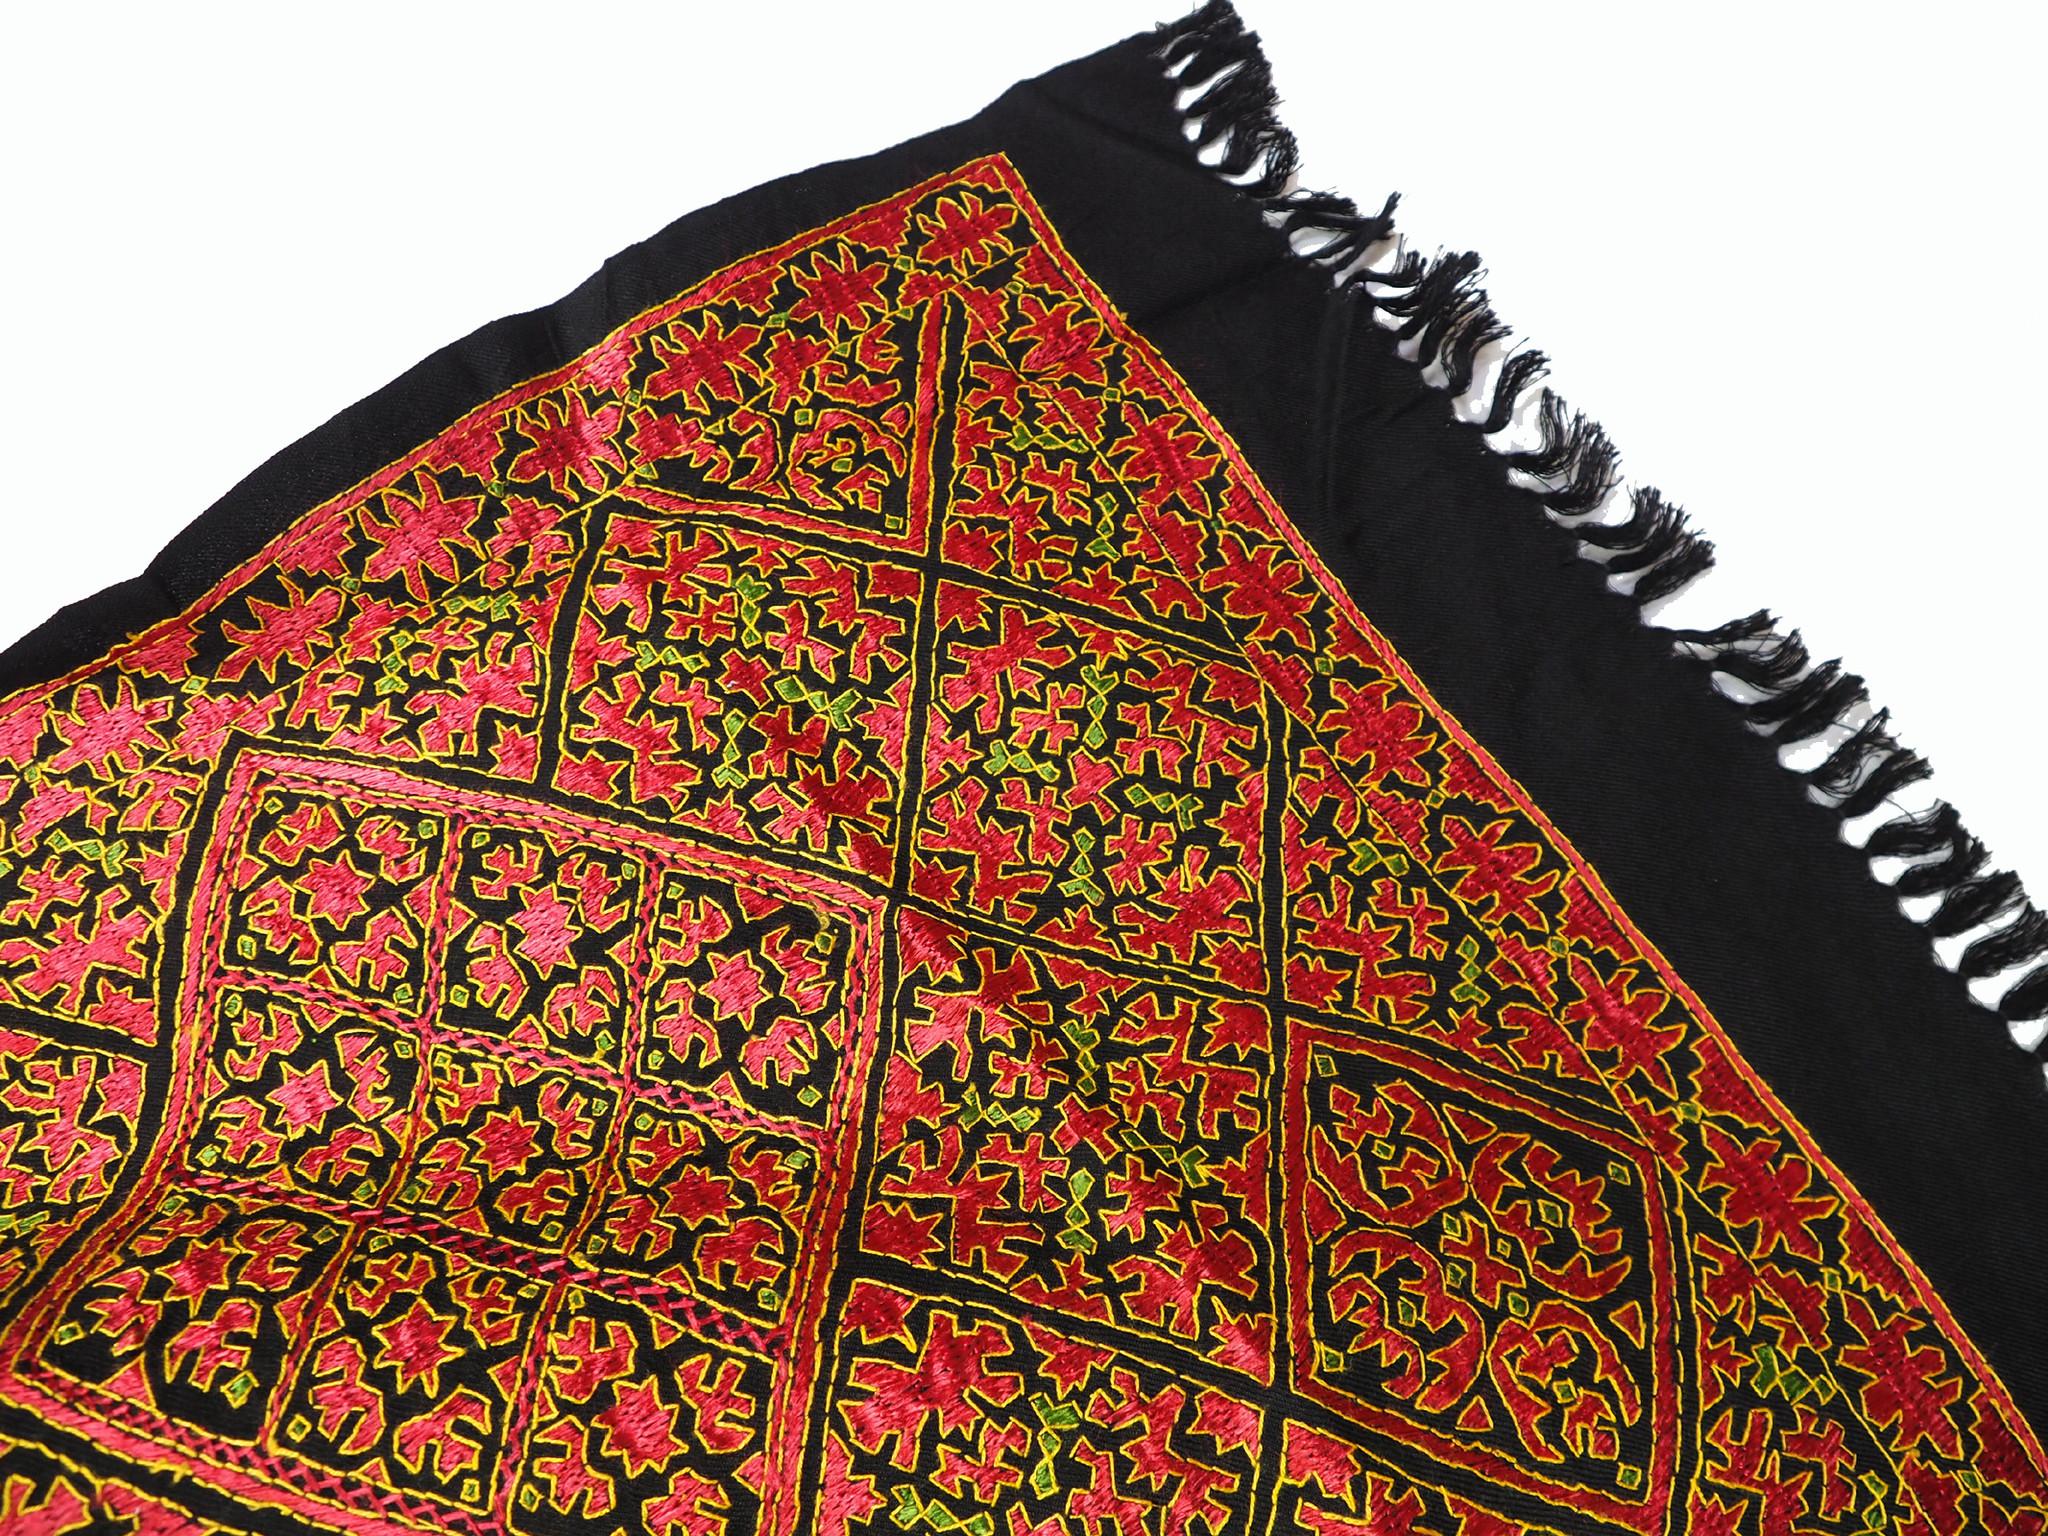 225x105 cm silk embroidered Pulkari  scarf, shawl, muffler Swat Valley 20/B